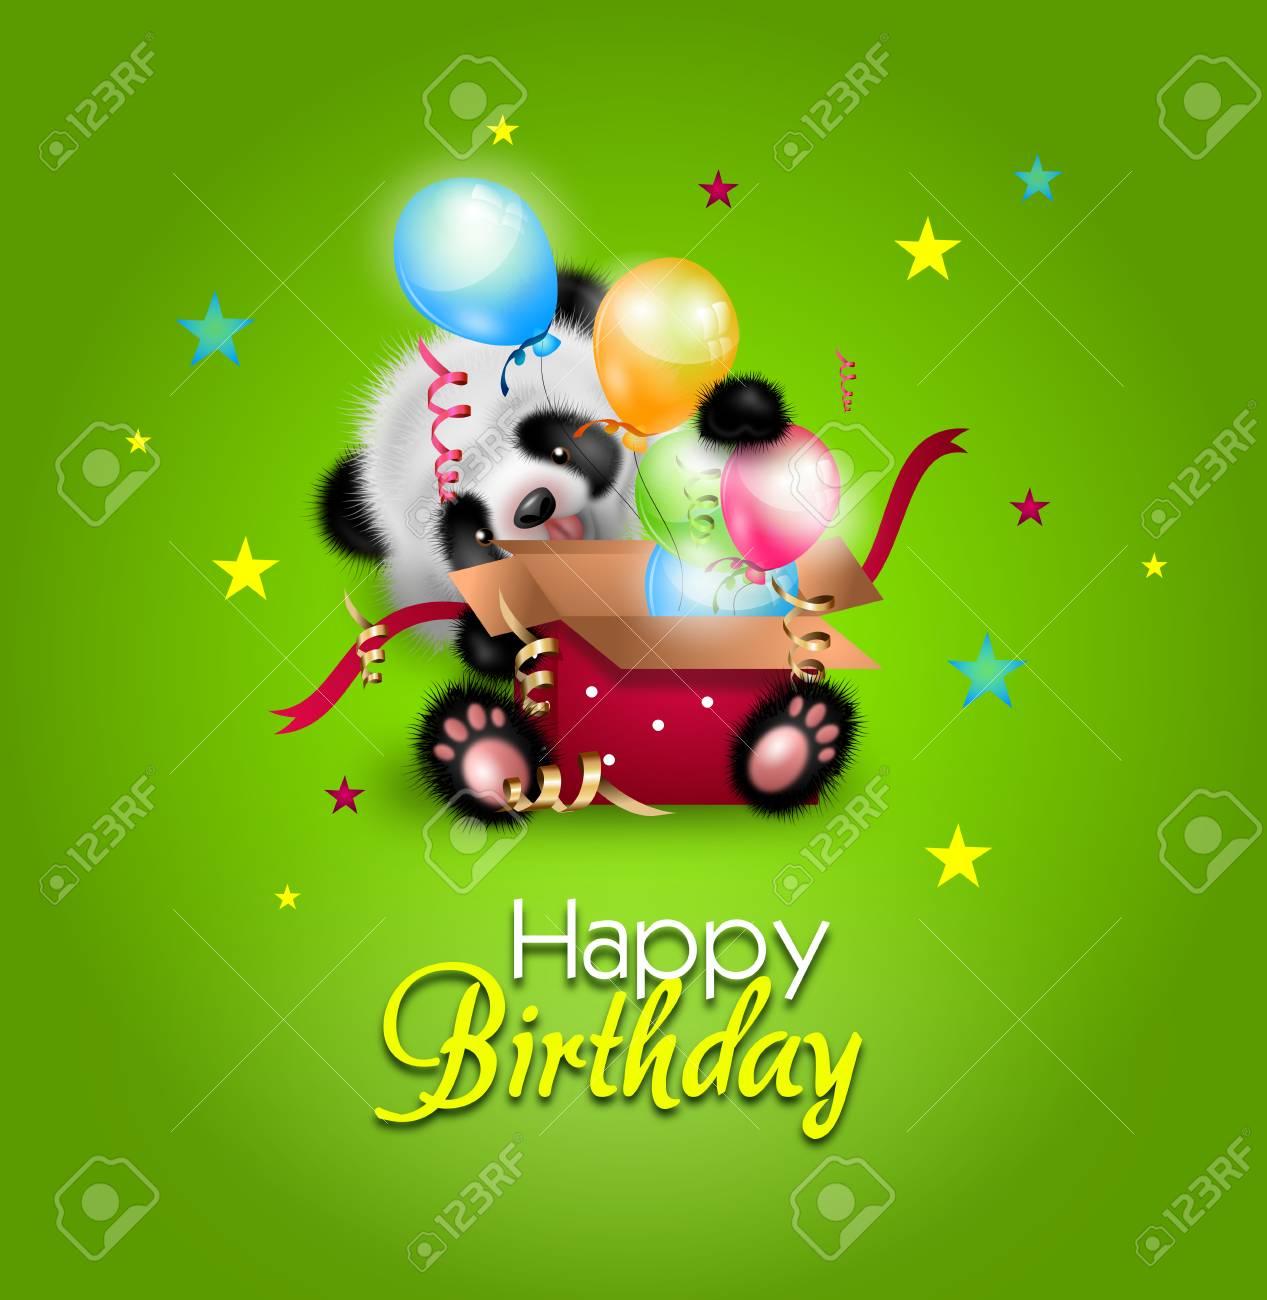 Illustration of happy birthday greeting card with cute illustration of happy birthday greeting card with cute illustration of panda stock illustration 88165468 kristyandbryce Images